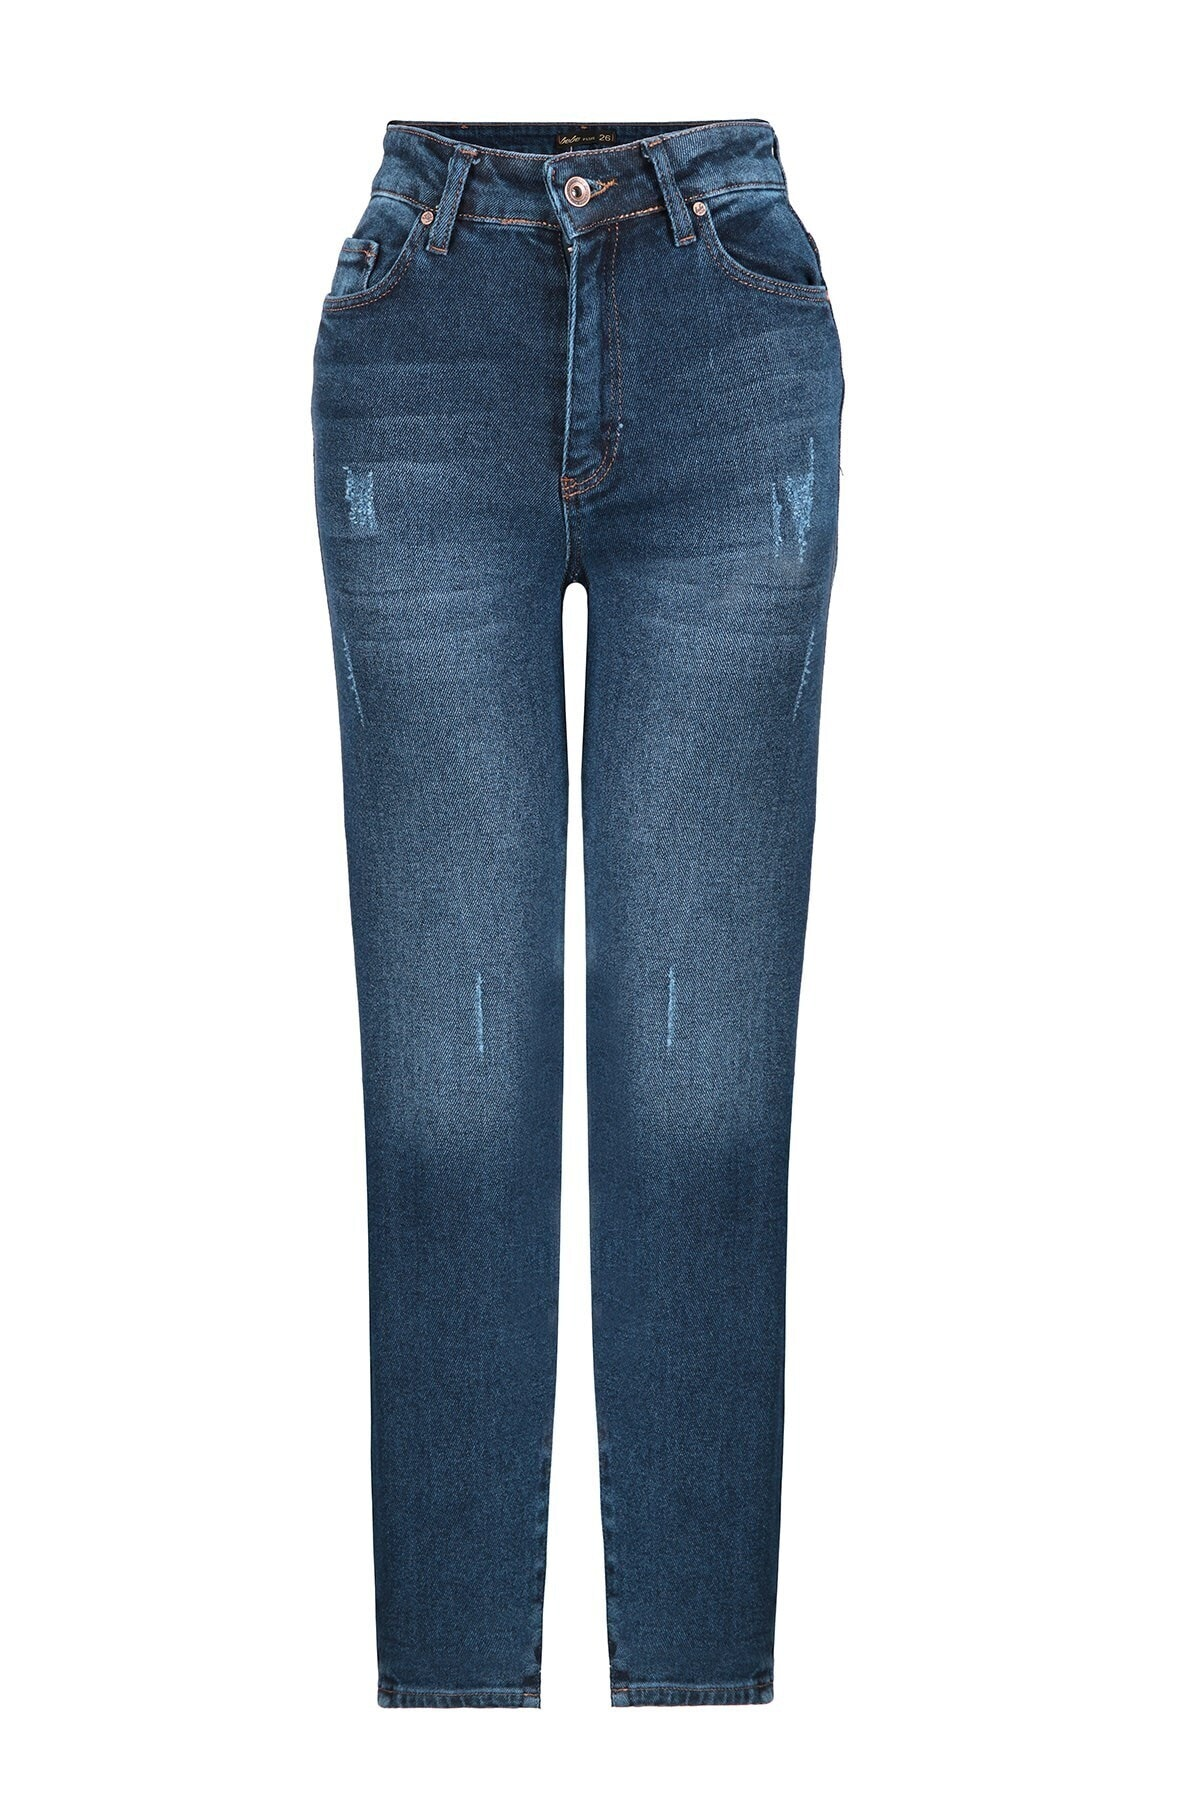 Oblavion Kadın Mavi Mom Jeans 1